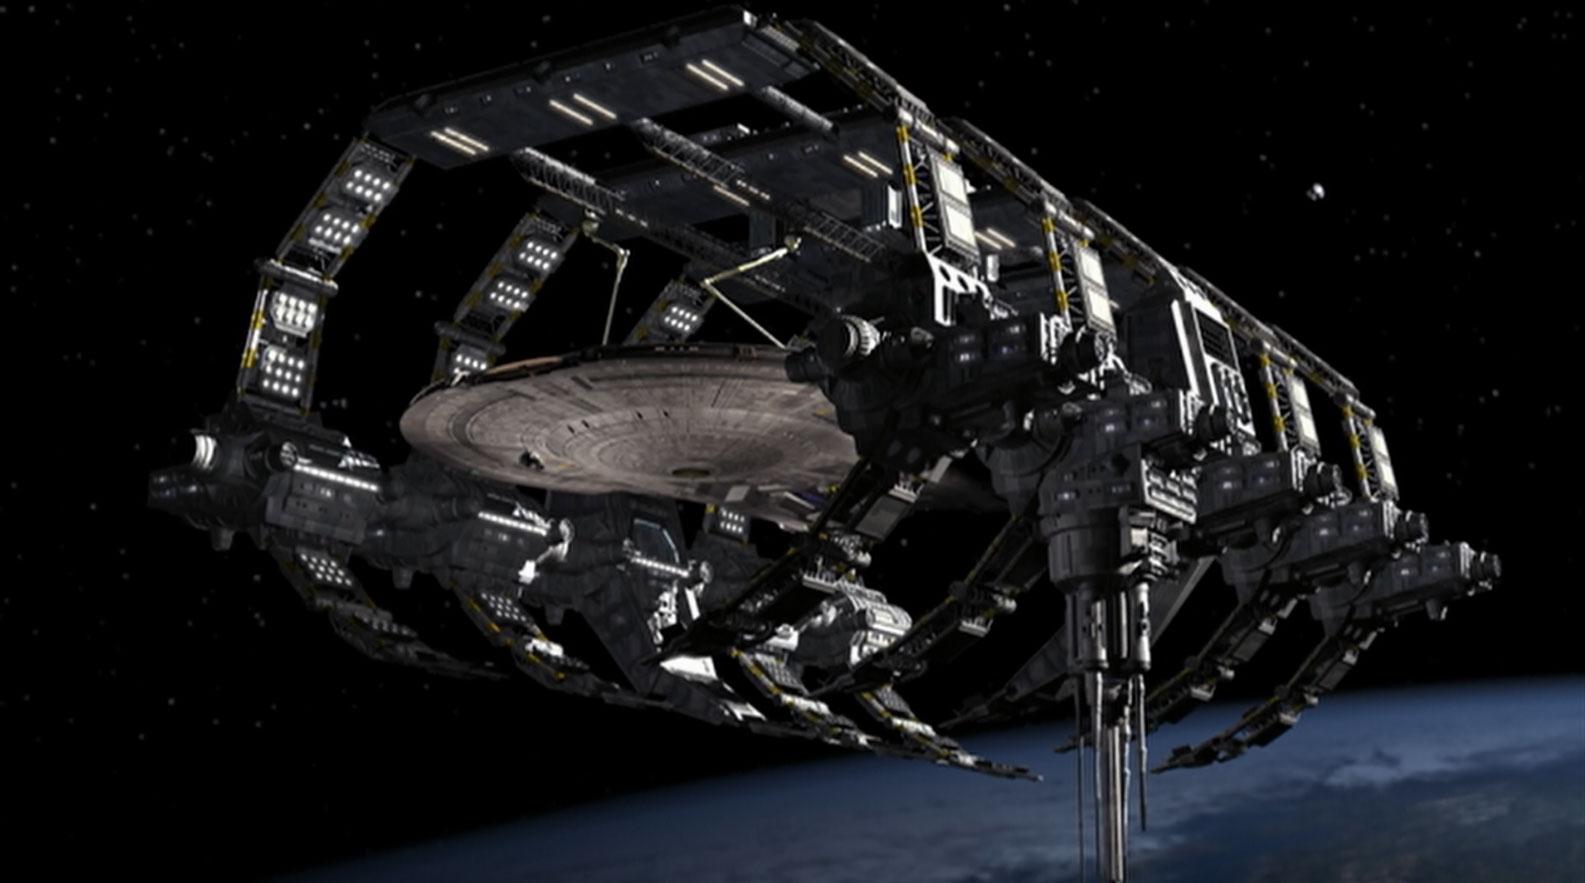 Orbital Drydock Facility